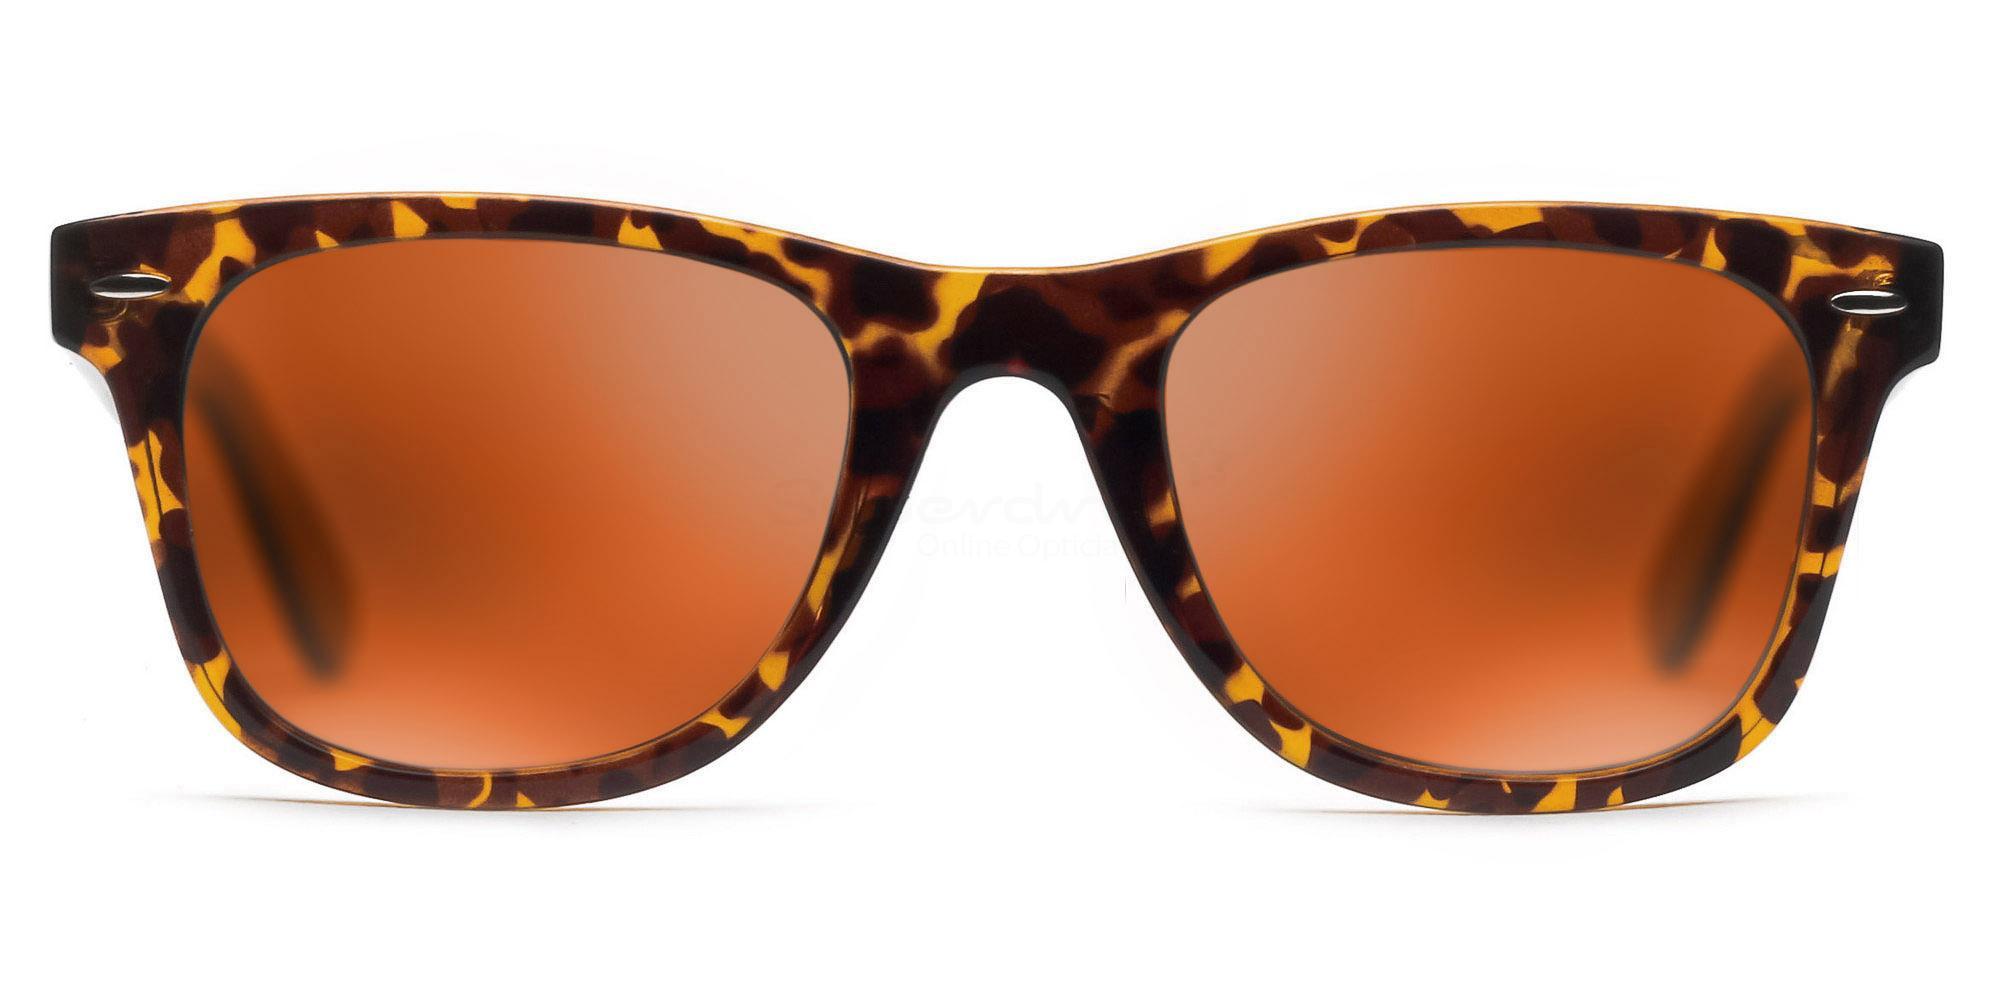 C04 Polarized Grey with Orange Mirror P2429 - Havana (Mirrored Polarized) Sunglasses, Neon